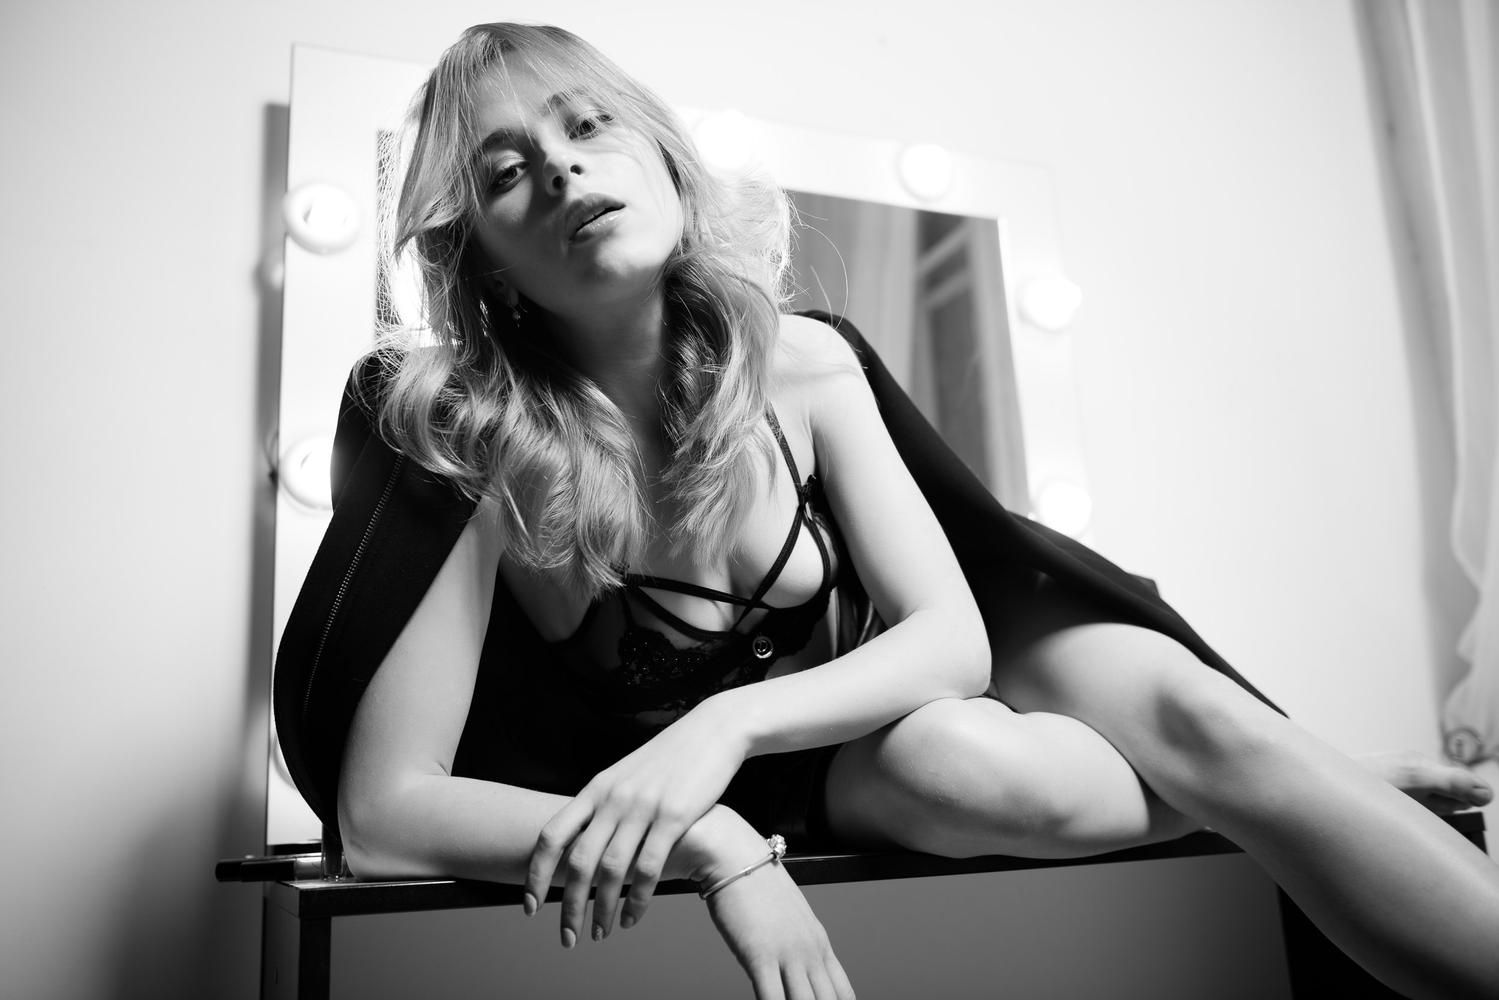 Анна Кошмал горячие фото